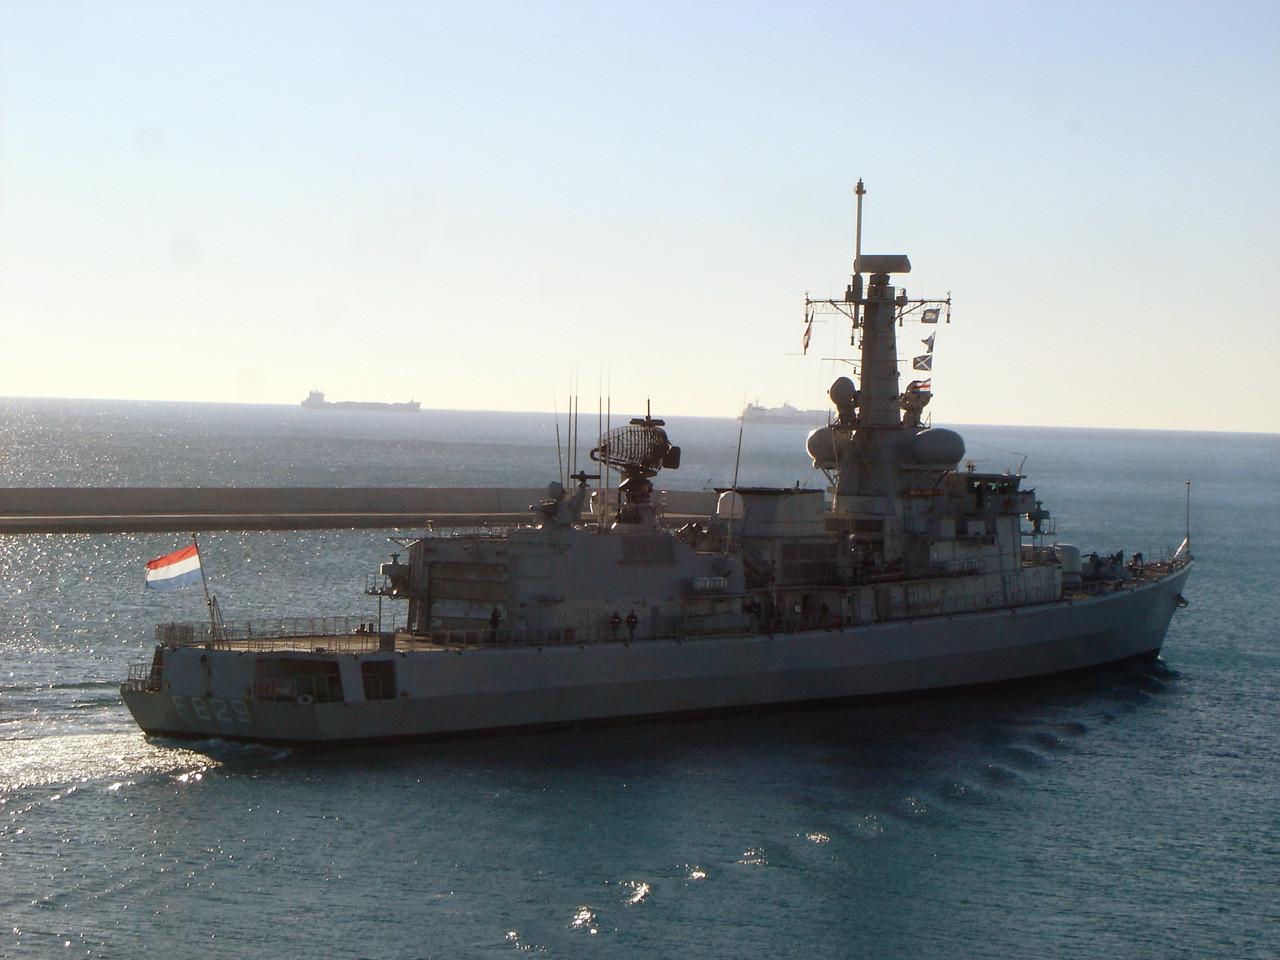 M-klasse fregatten (Karel Doorman M-class frigates) 162639